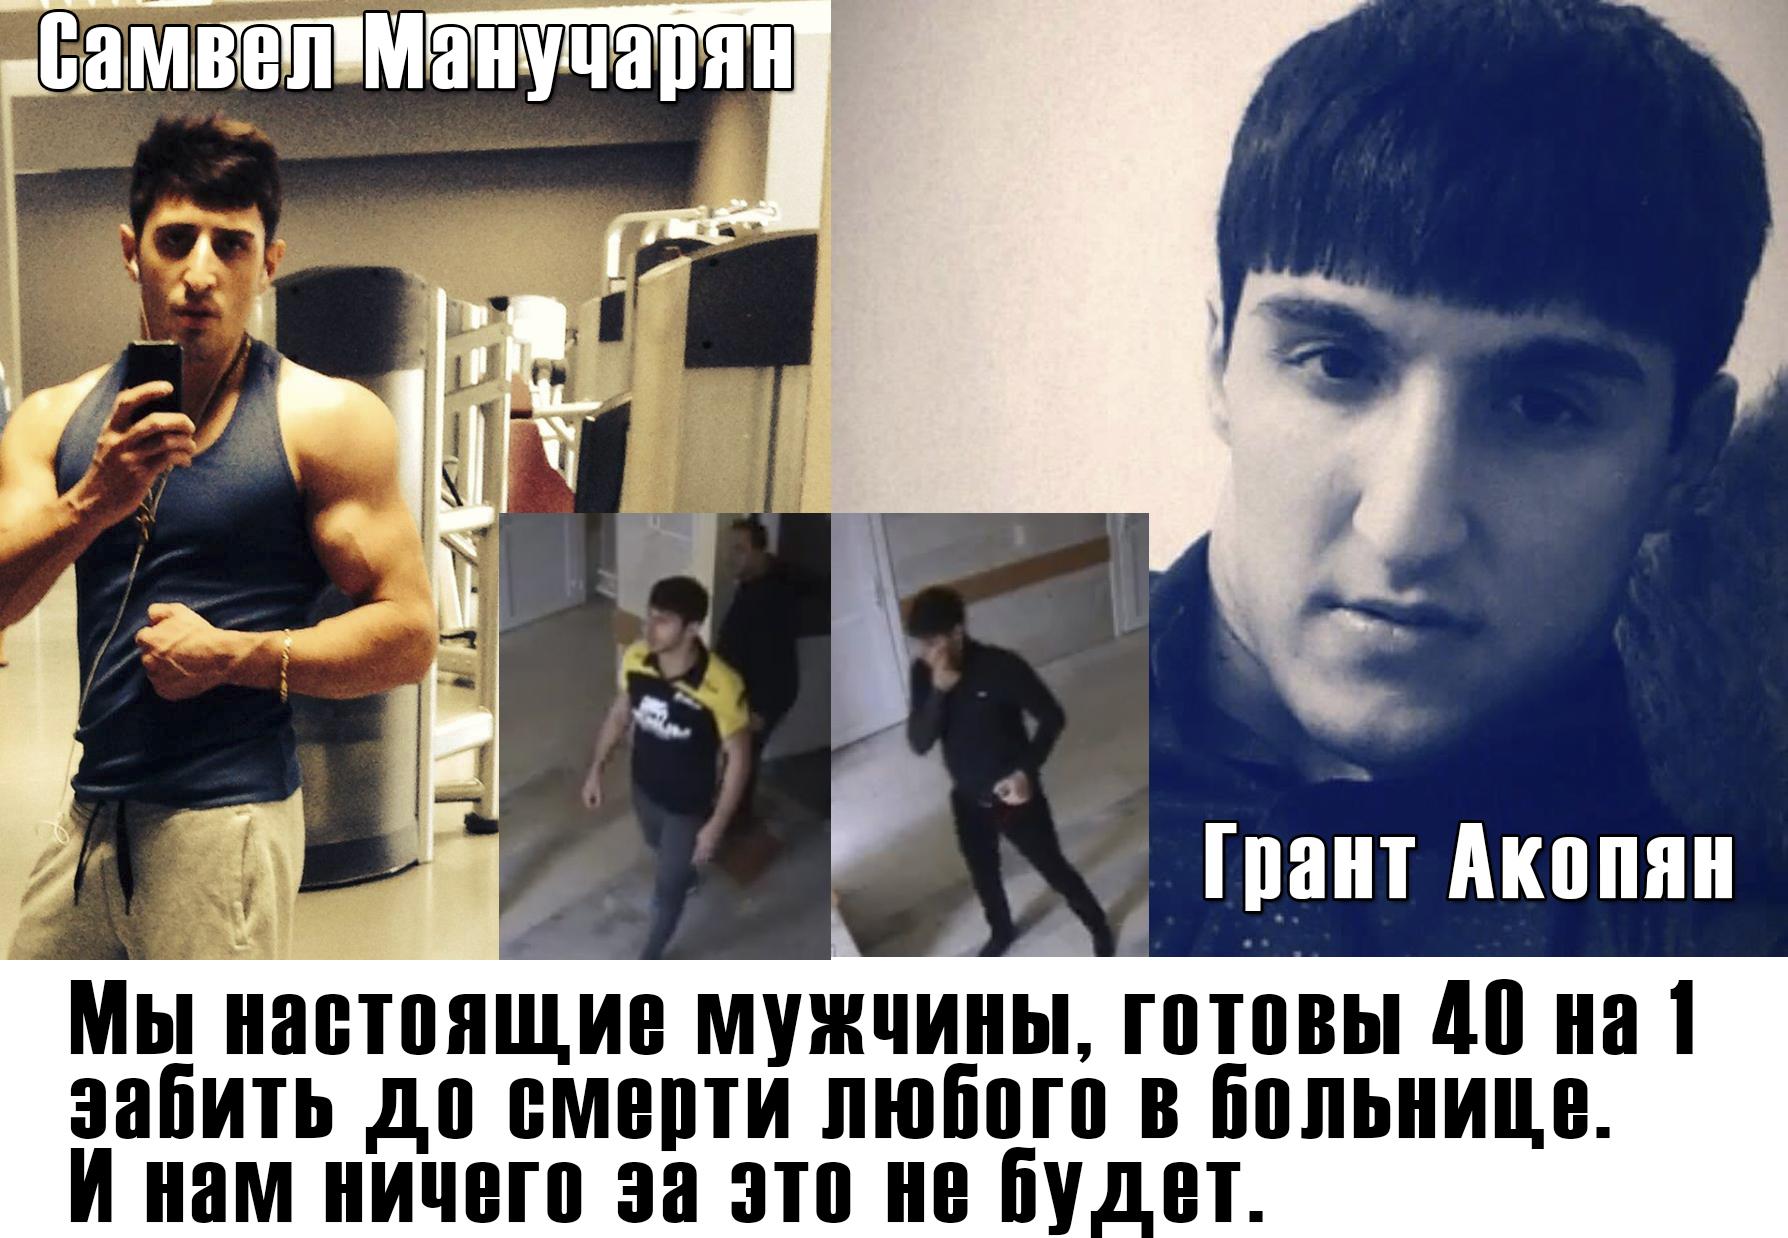 http://ic.pics.livejournal.com/babaev_elshad/49350489/44925/44925_original.jpg